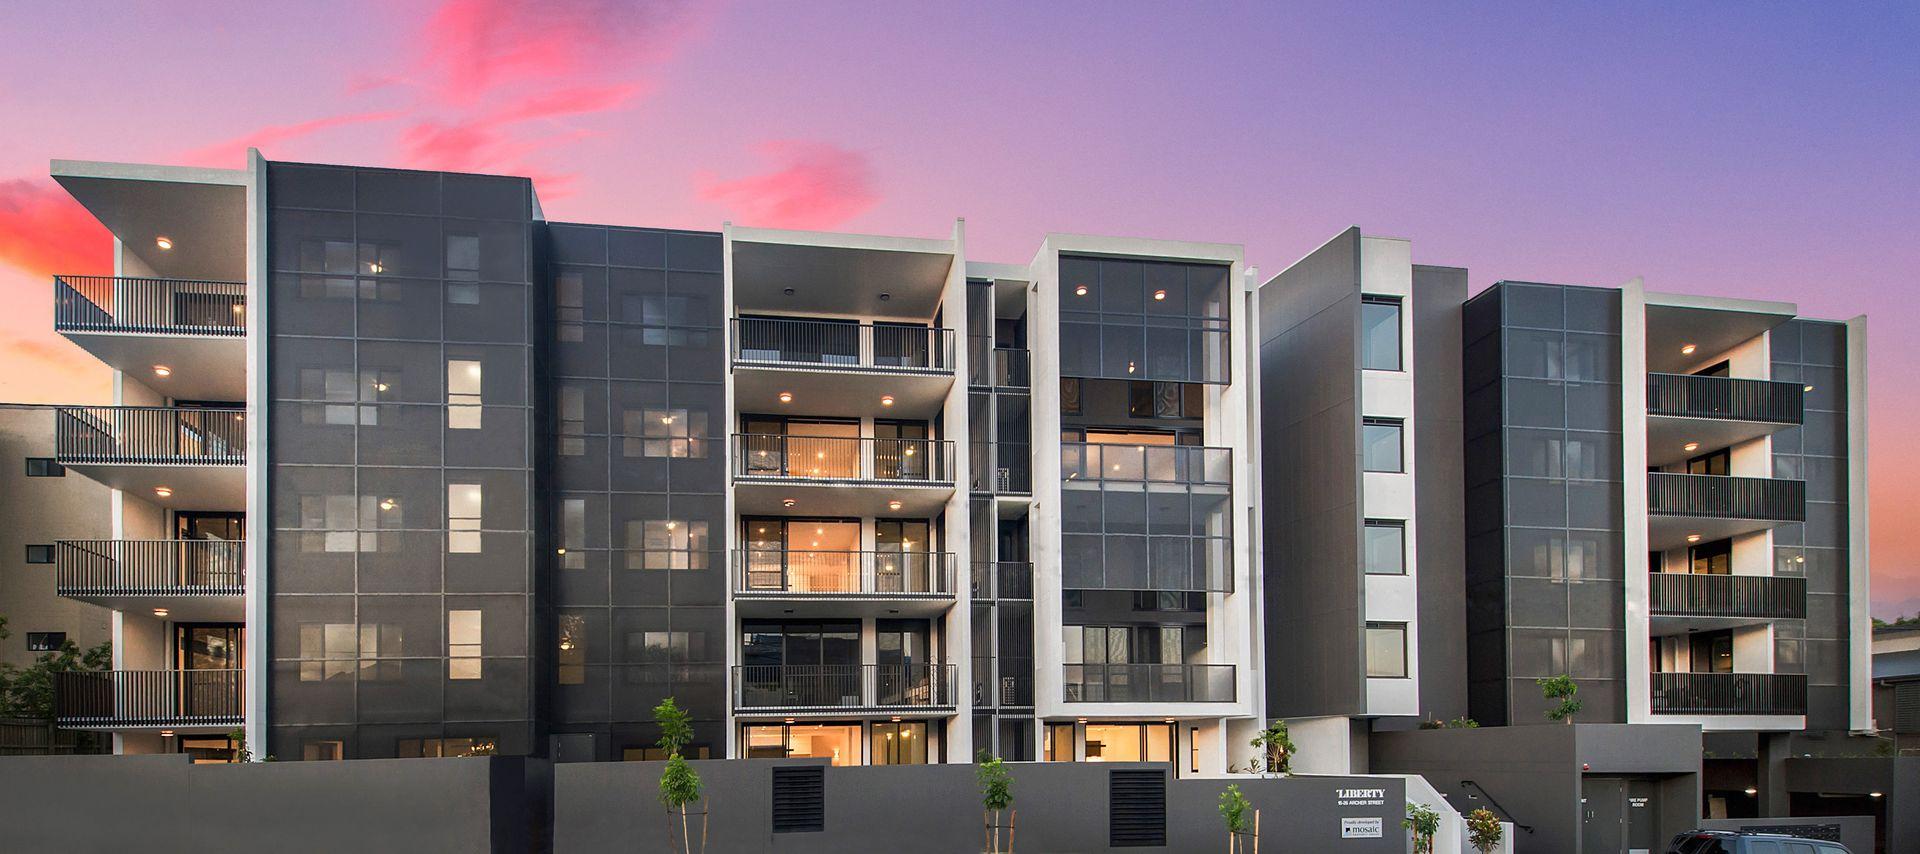 507/16-26 Archer Street, Upper Mount Gravatt QLD 4122, Image 0